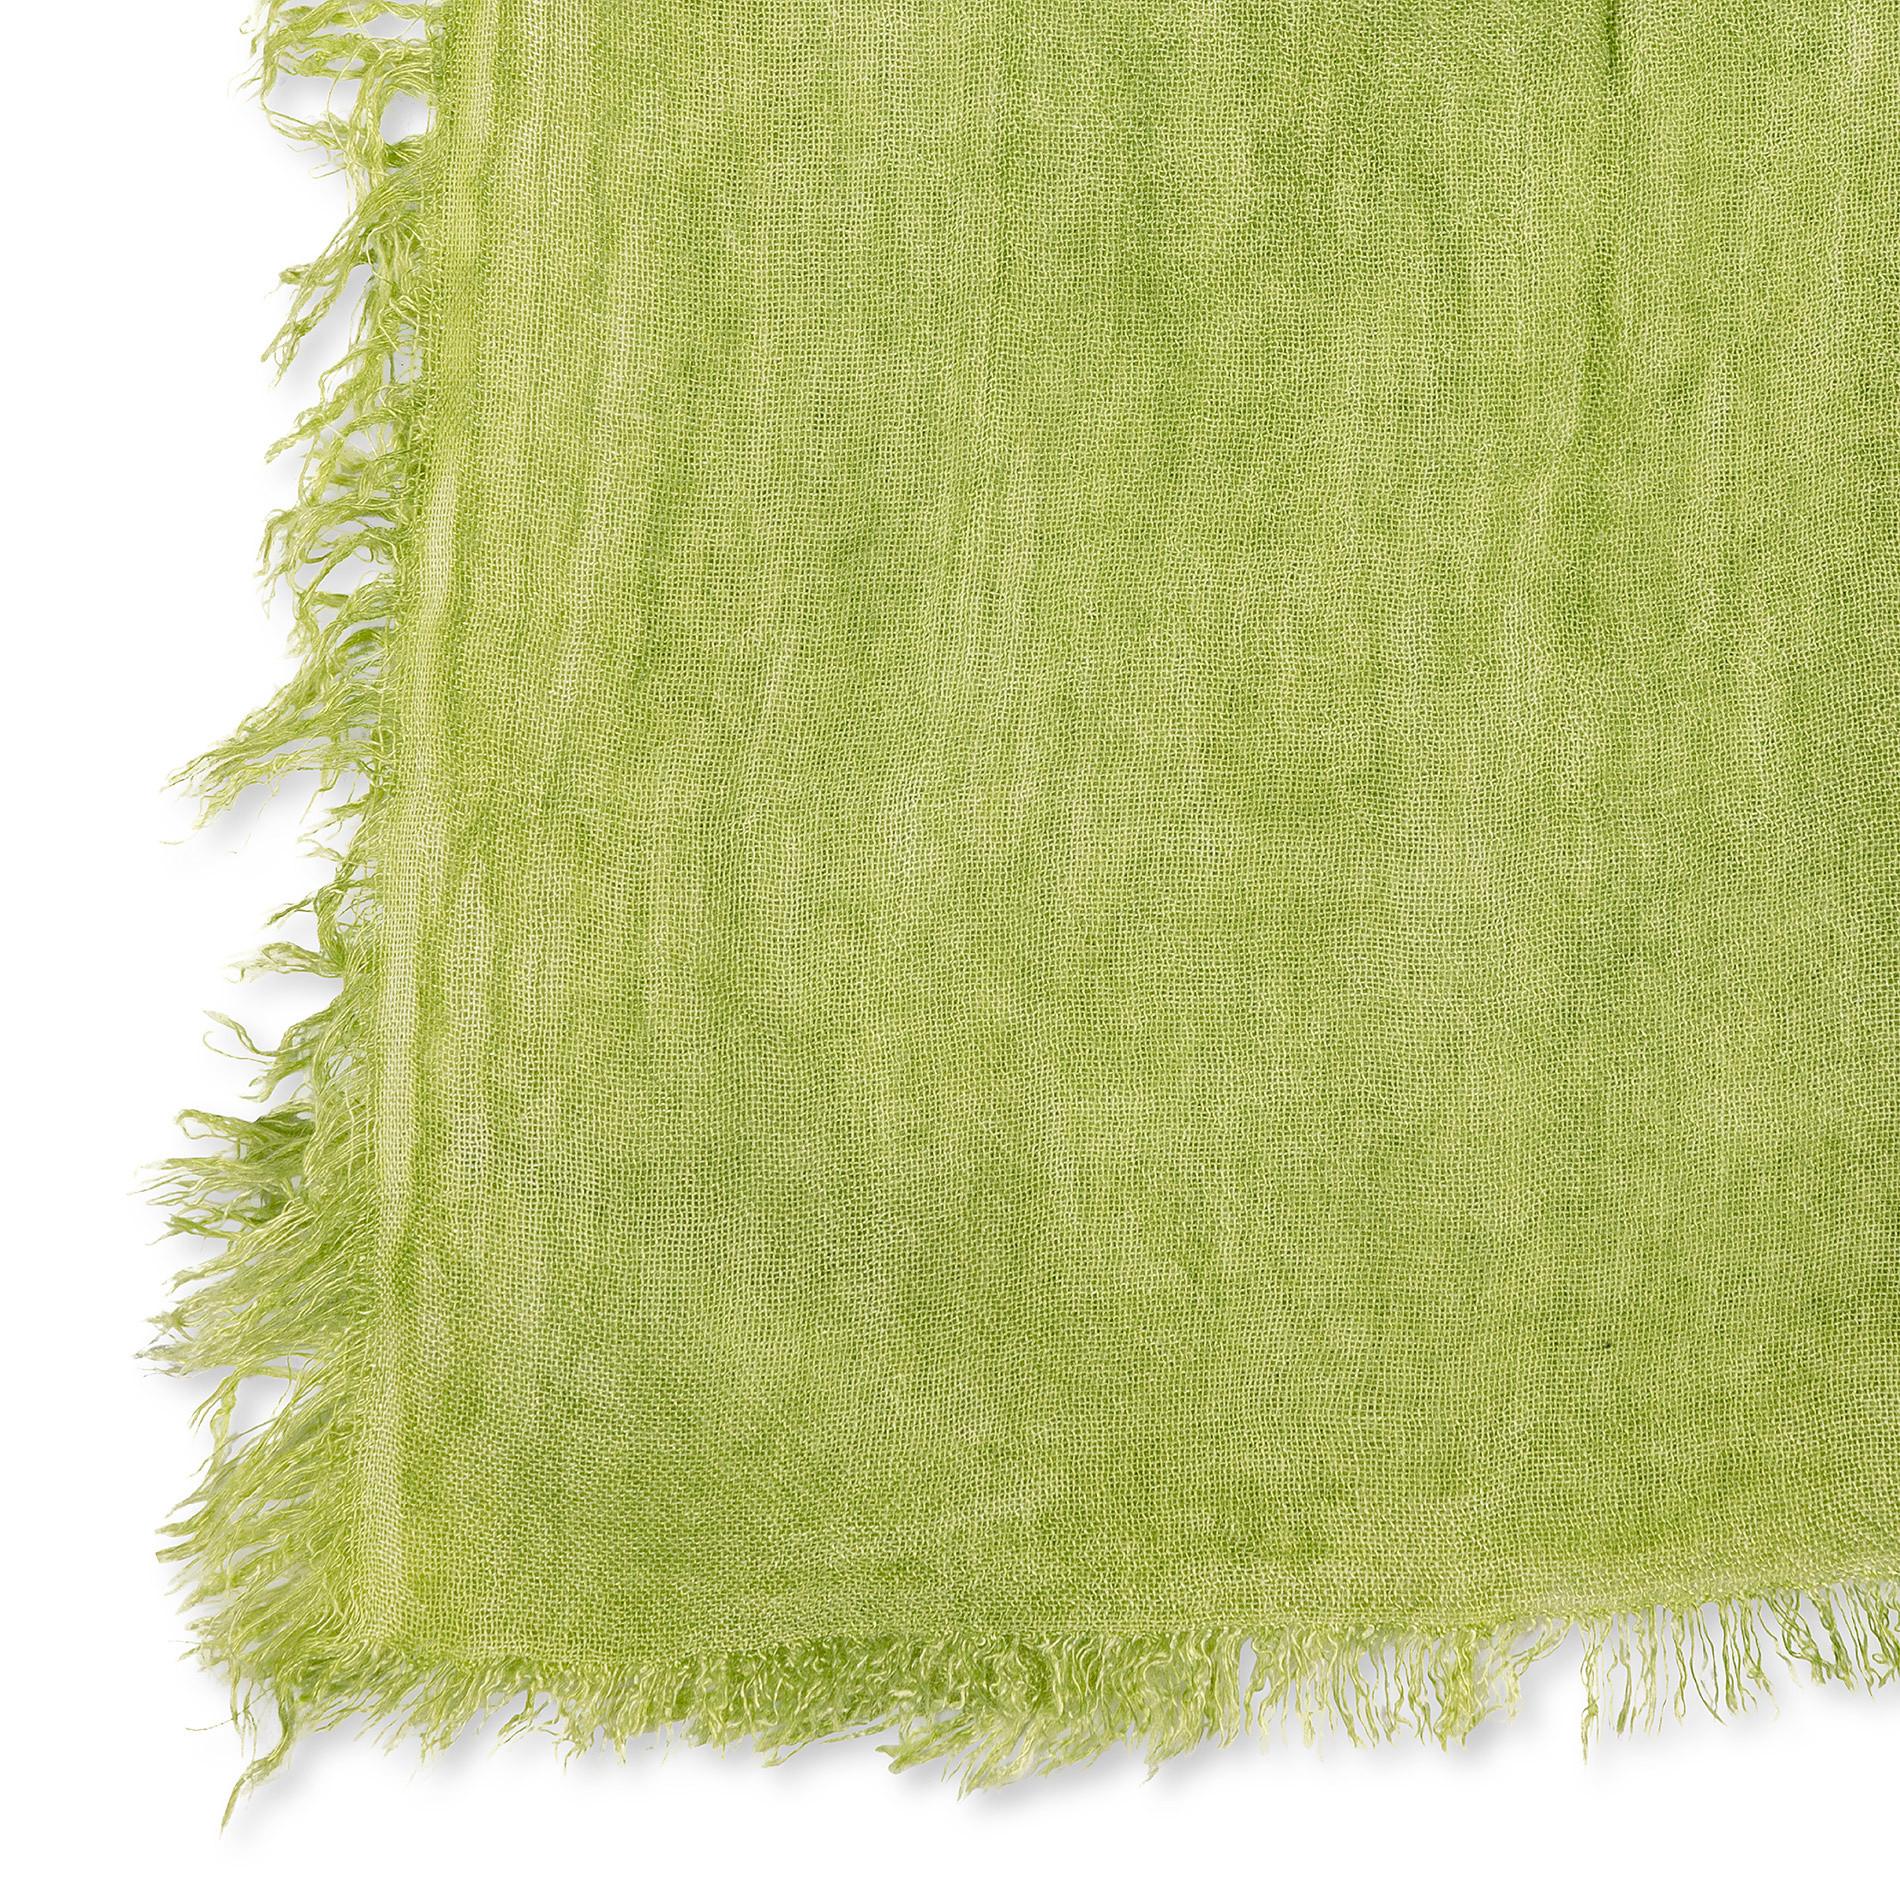 Stola in viscosa di bamboo tinta unita, Verde, large image number 1